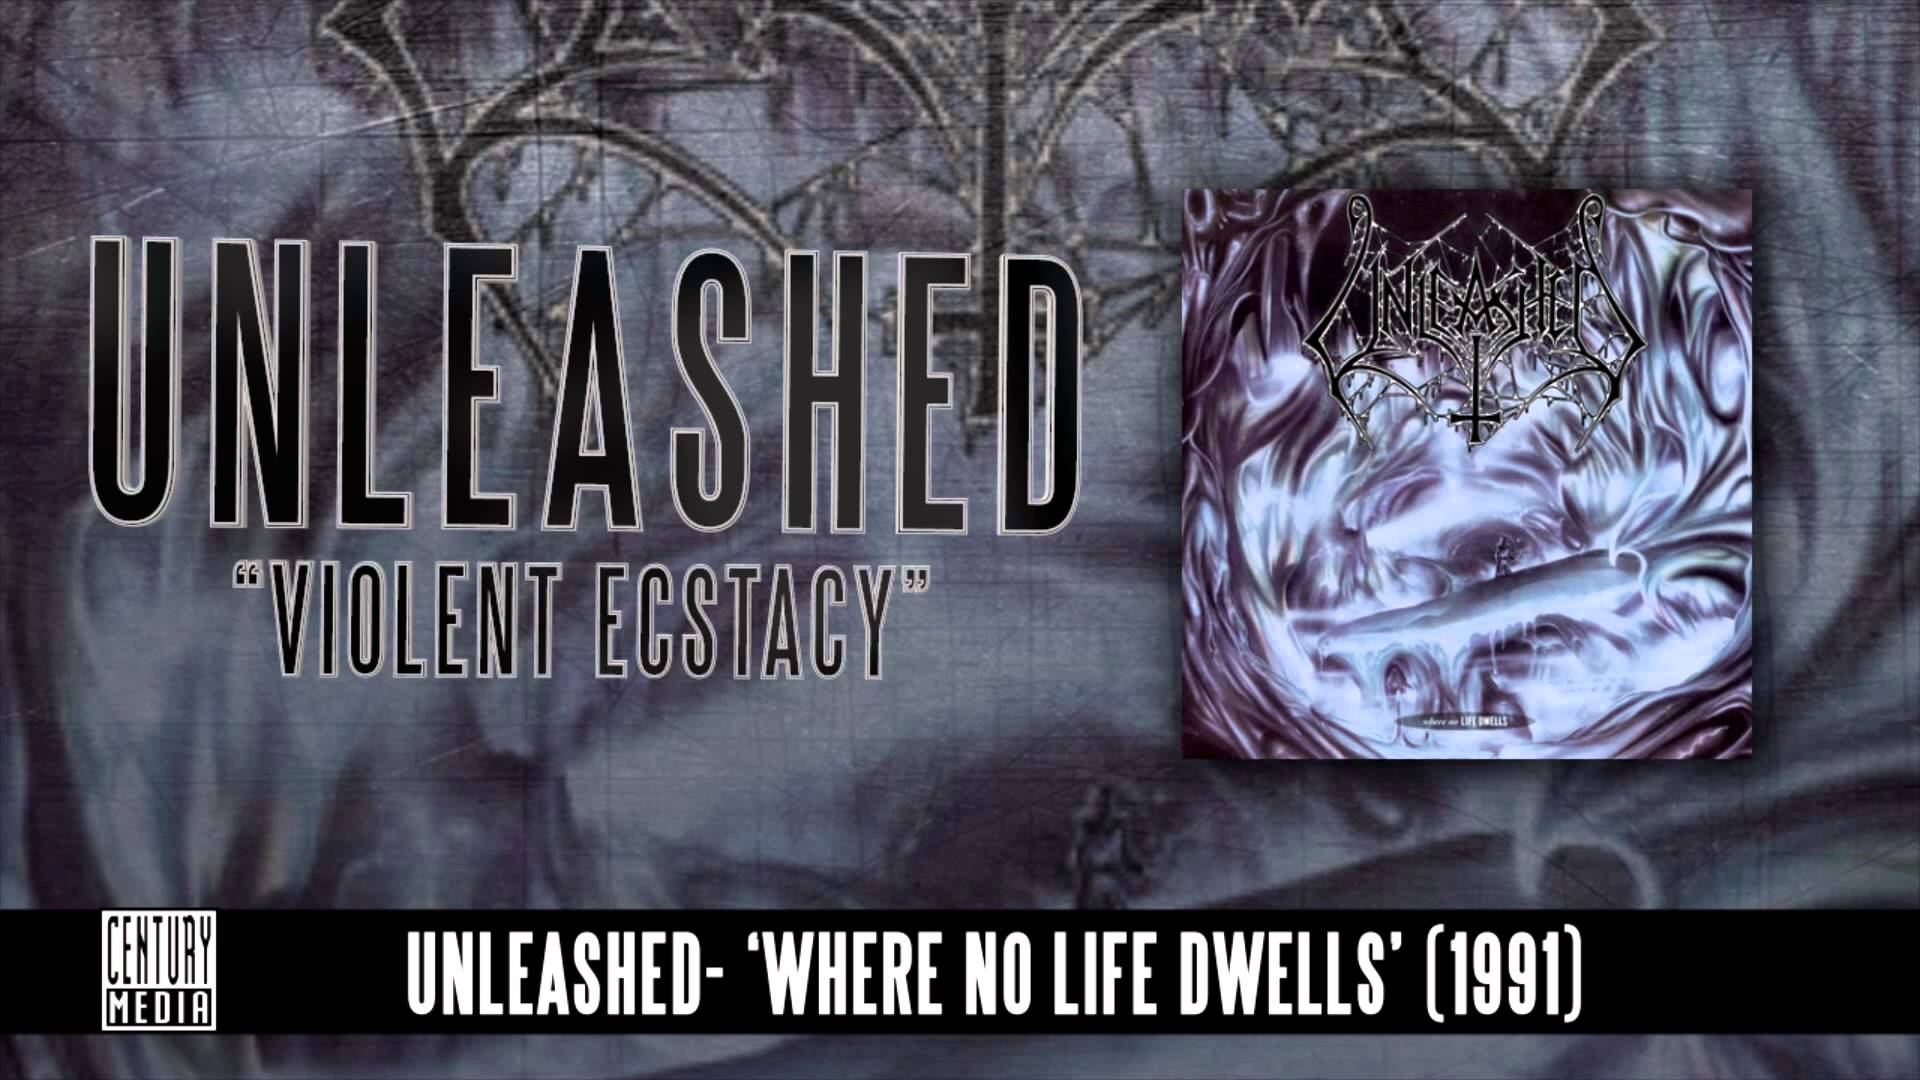 UNLEASHED - Violent Ecstasy (ALBUM TRACK)